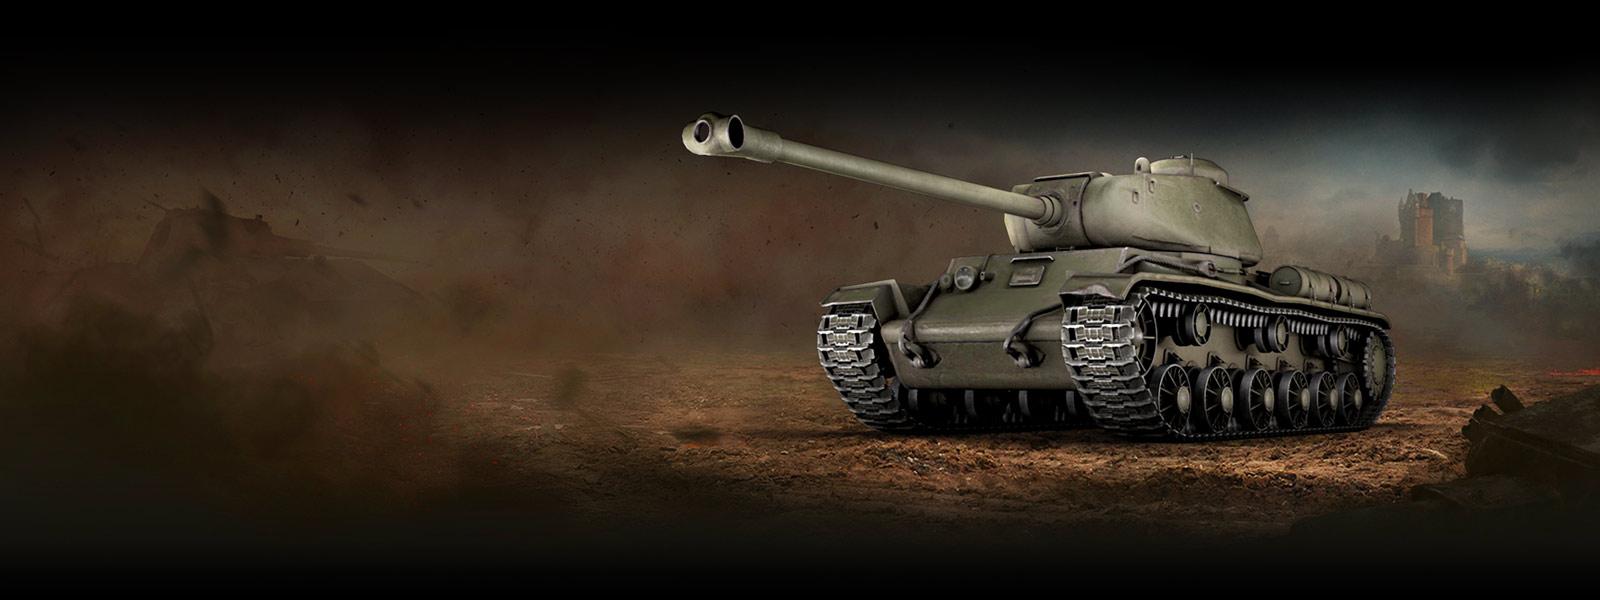 Heavy class tank